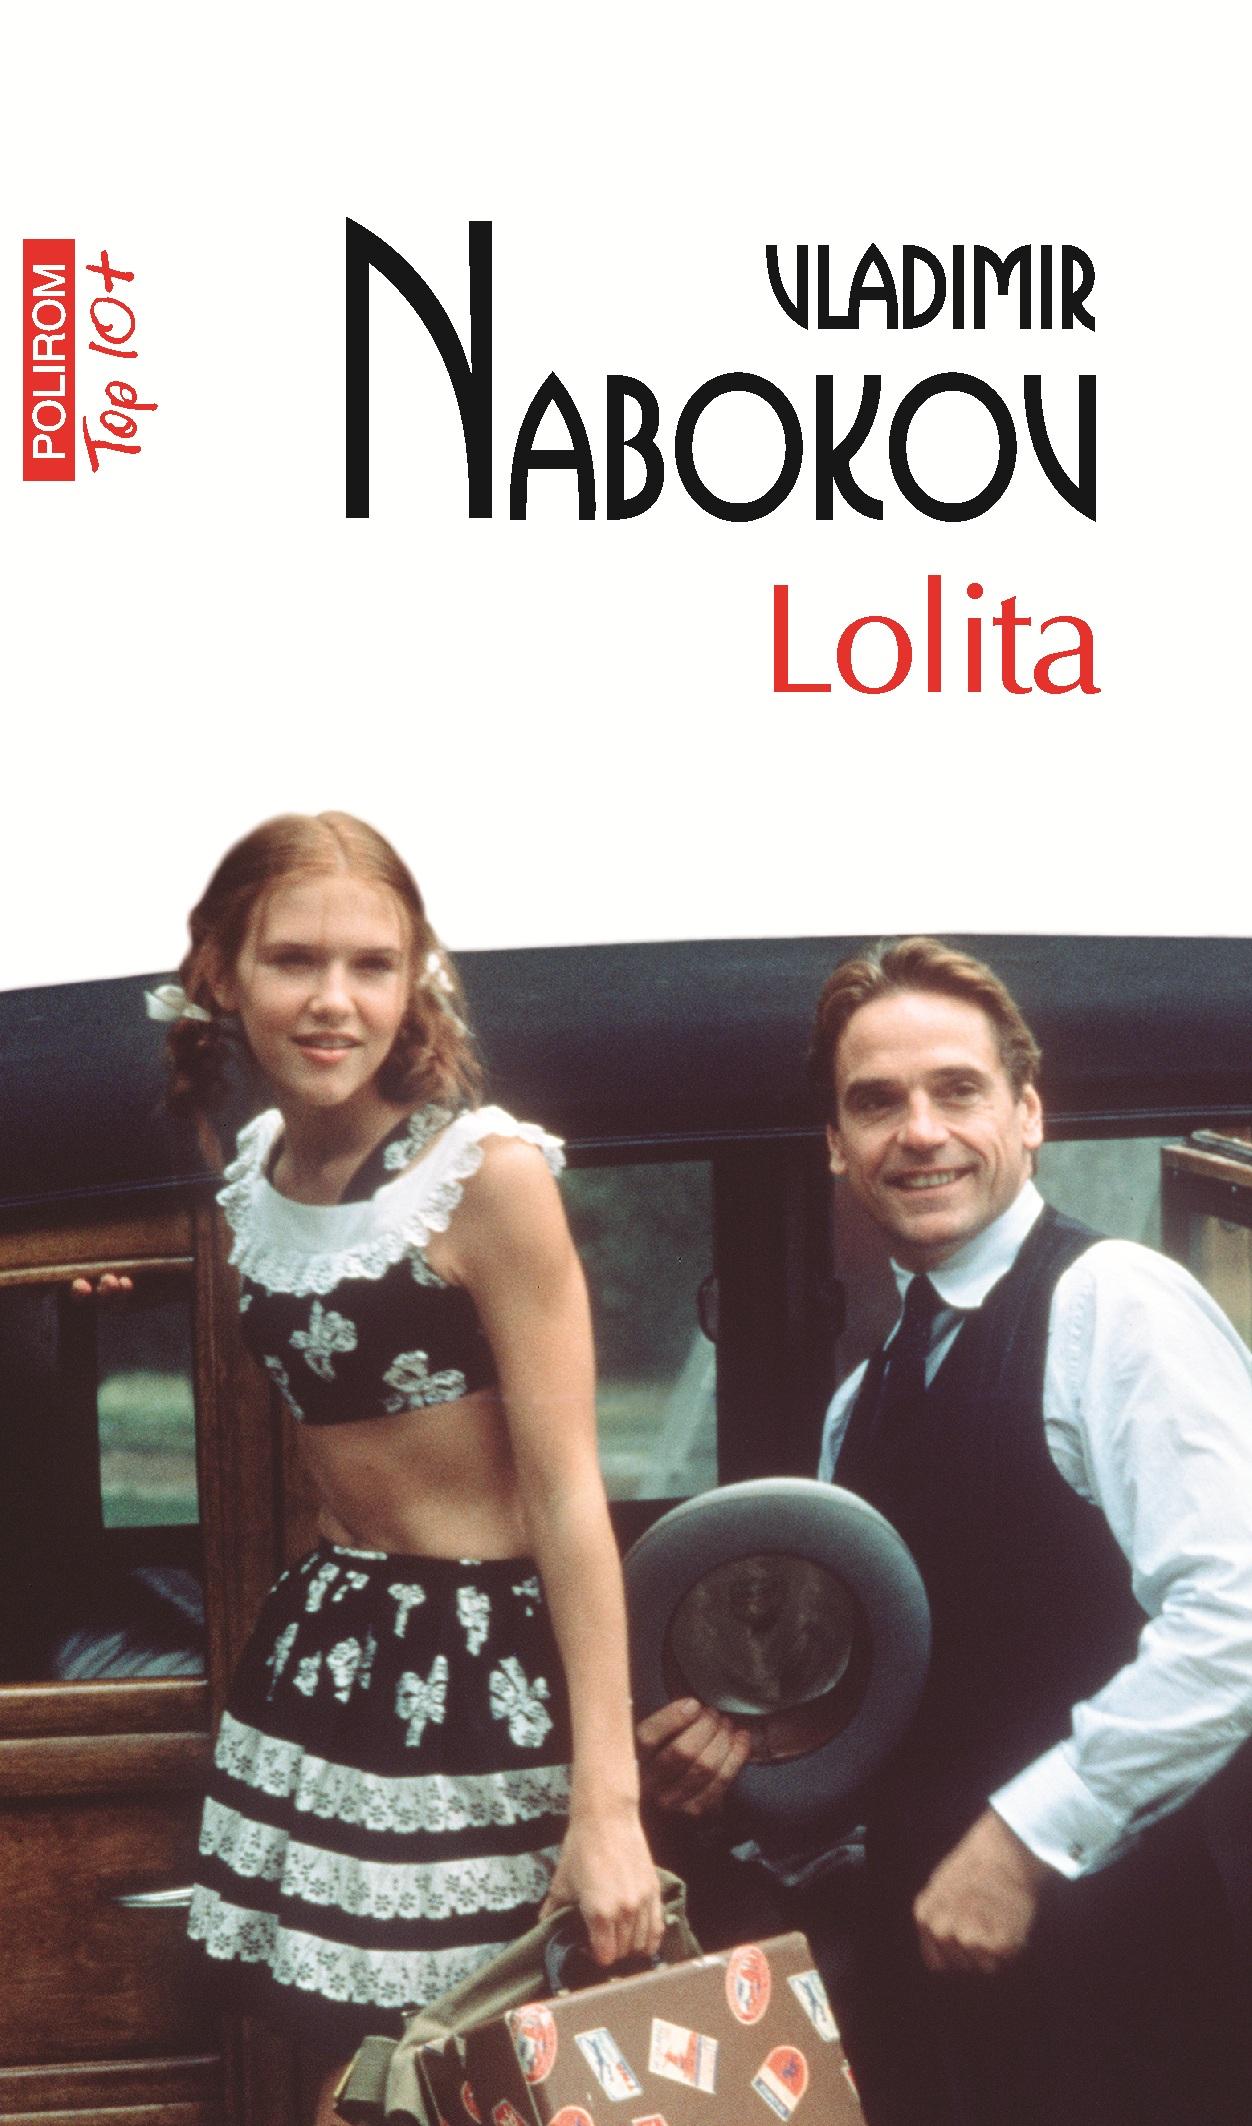 Incitată de Lolita lui Vladimir Nabokov